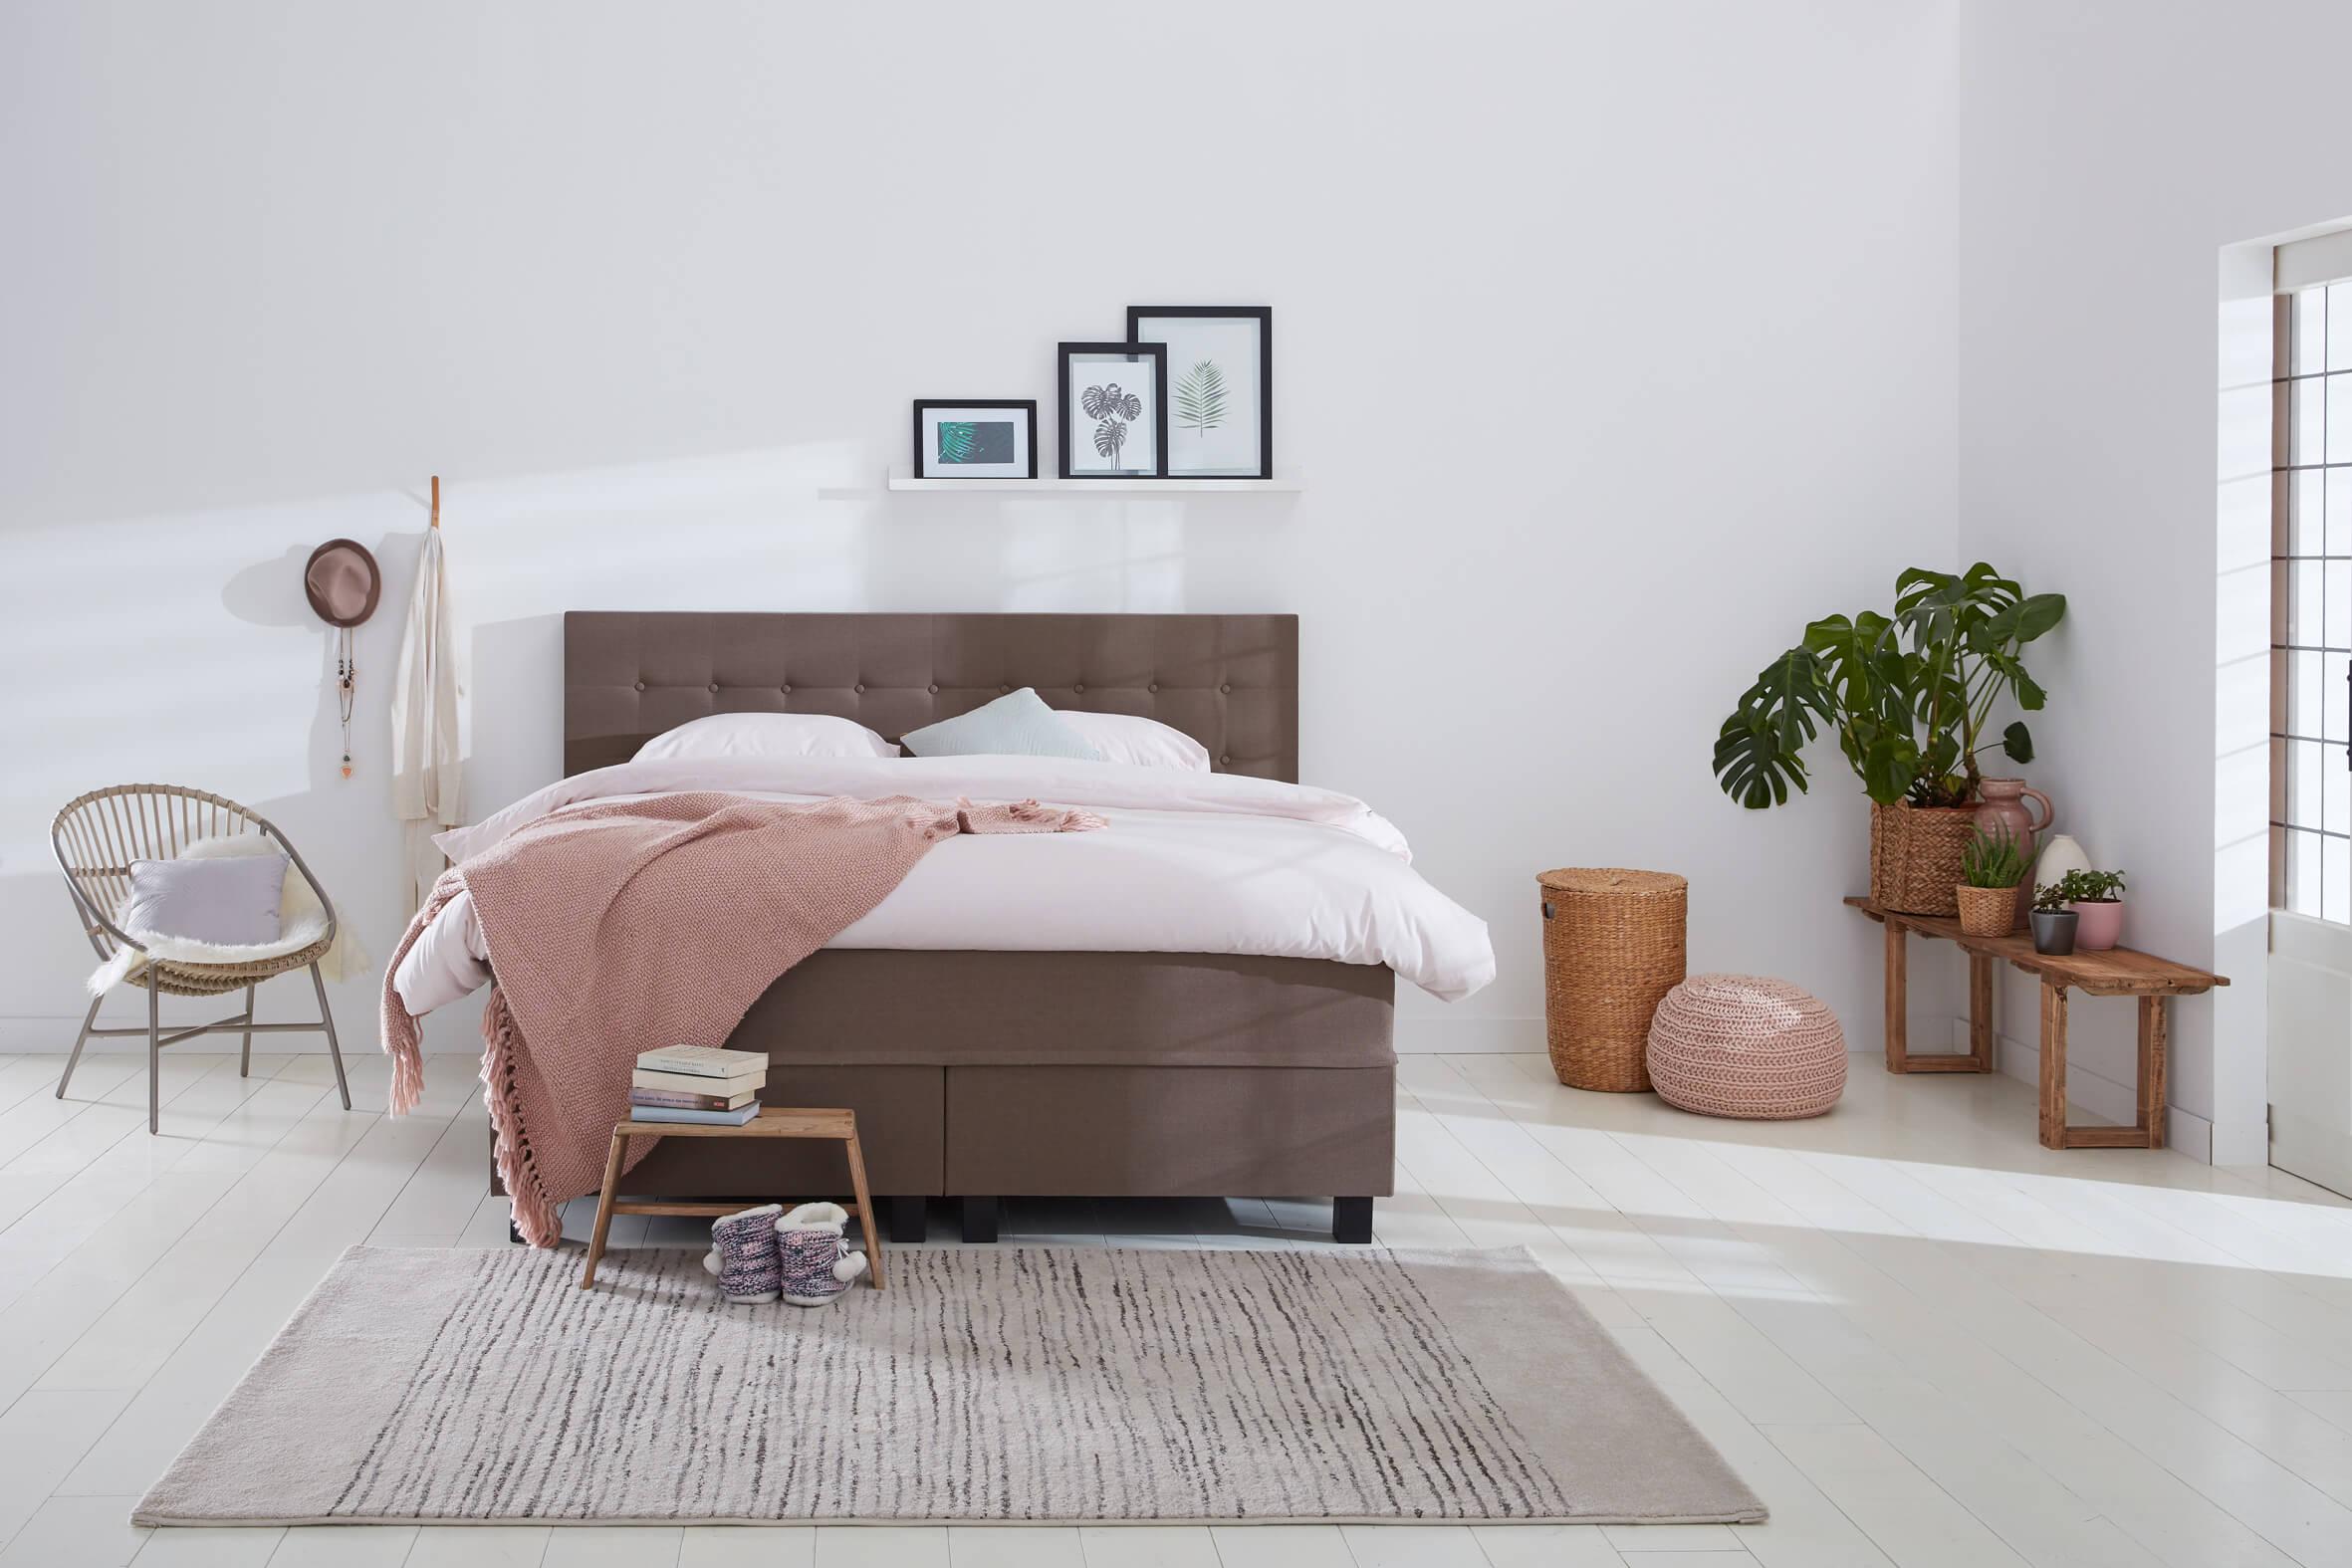 boxspringbett home 195 swiss sense. Black Bedroom Furniture Sets. Home Design Ideas